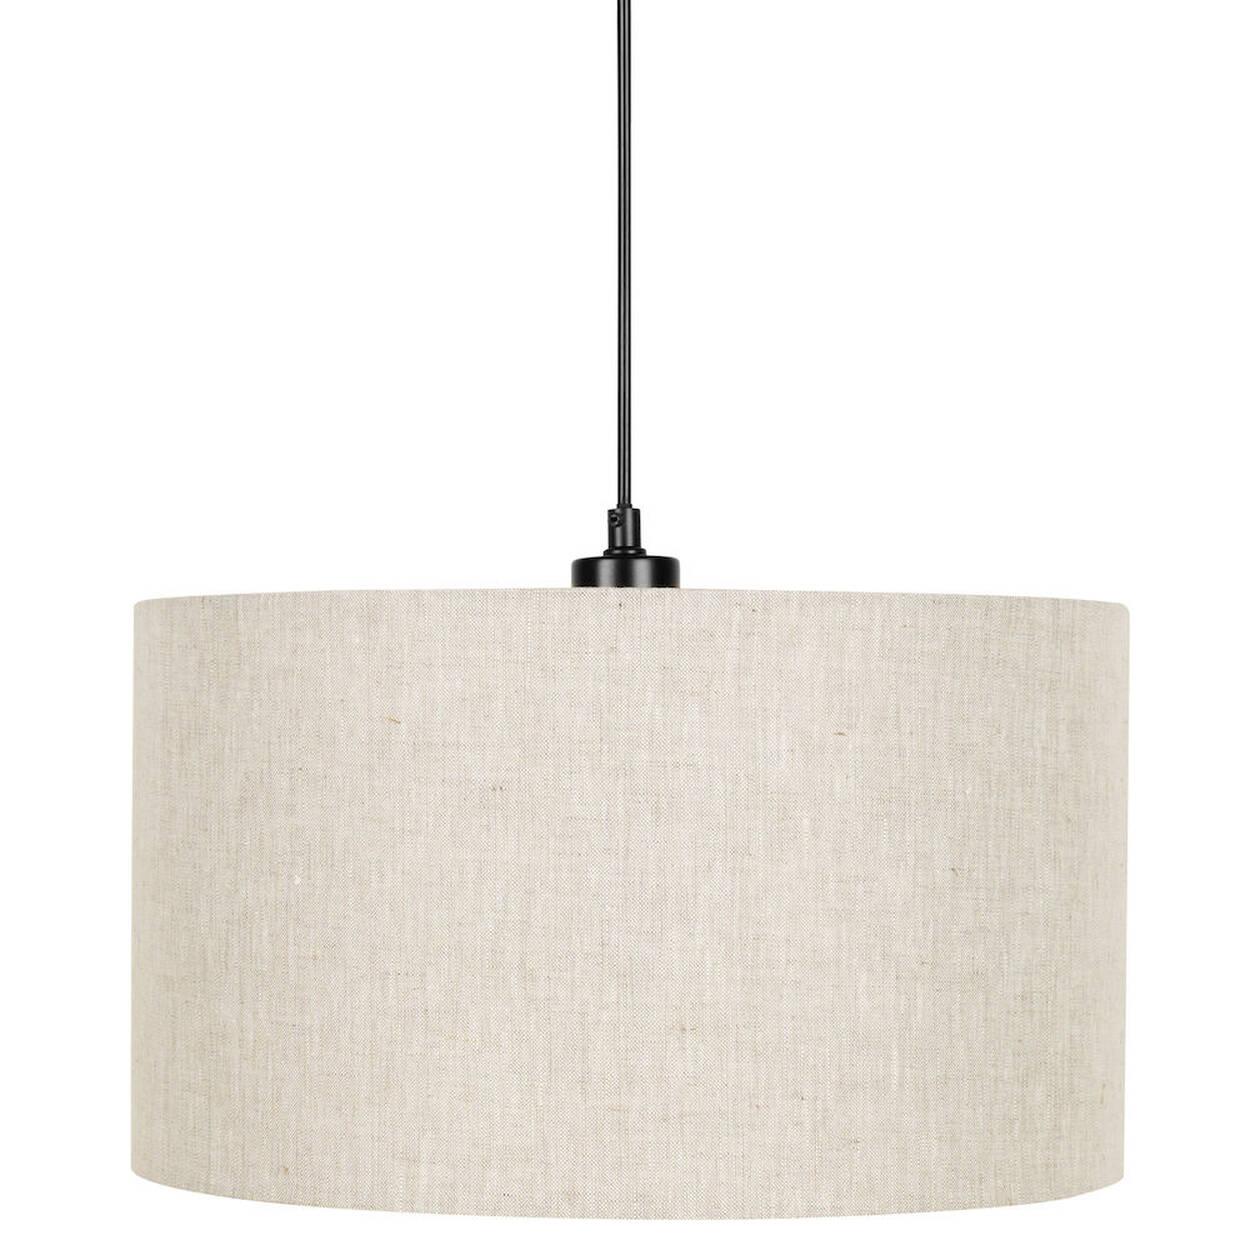 Lampe suspendue ronde en lin - Lampe suspendue avec prise murale ...